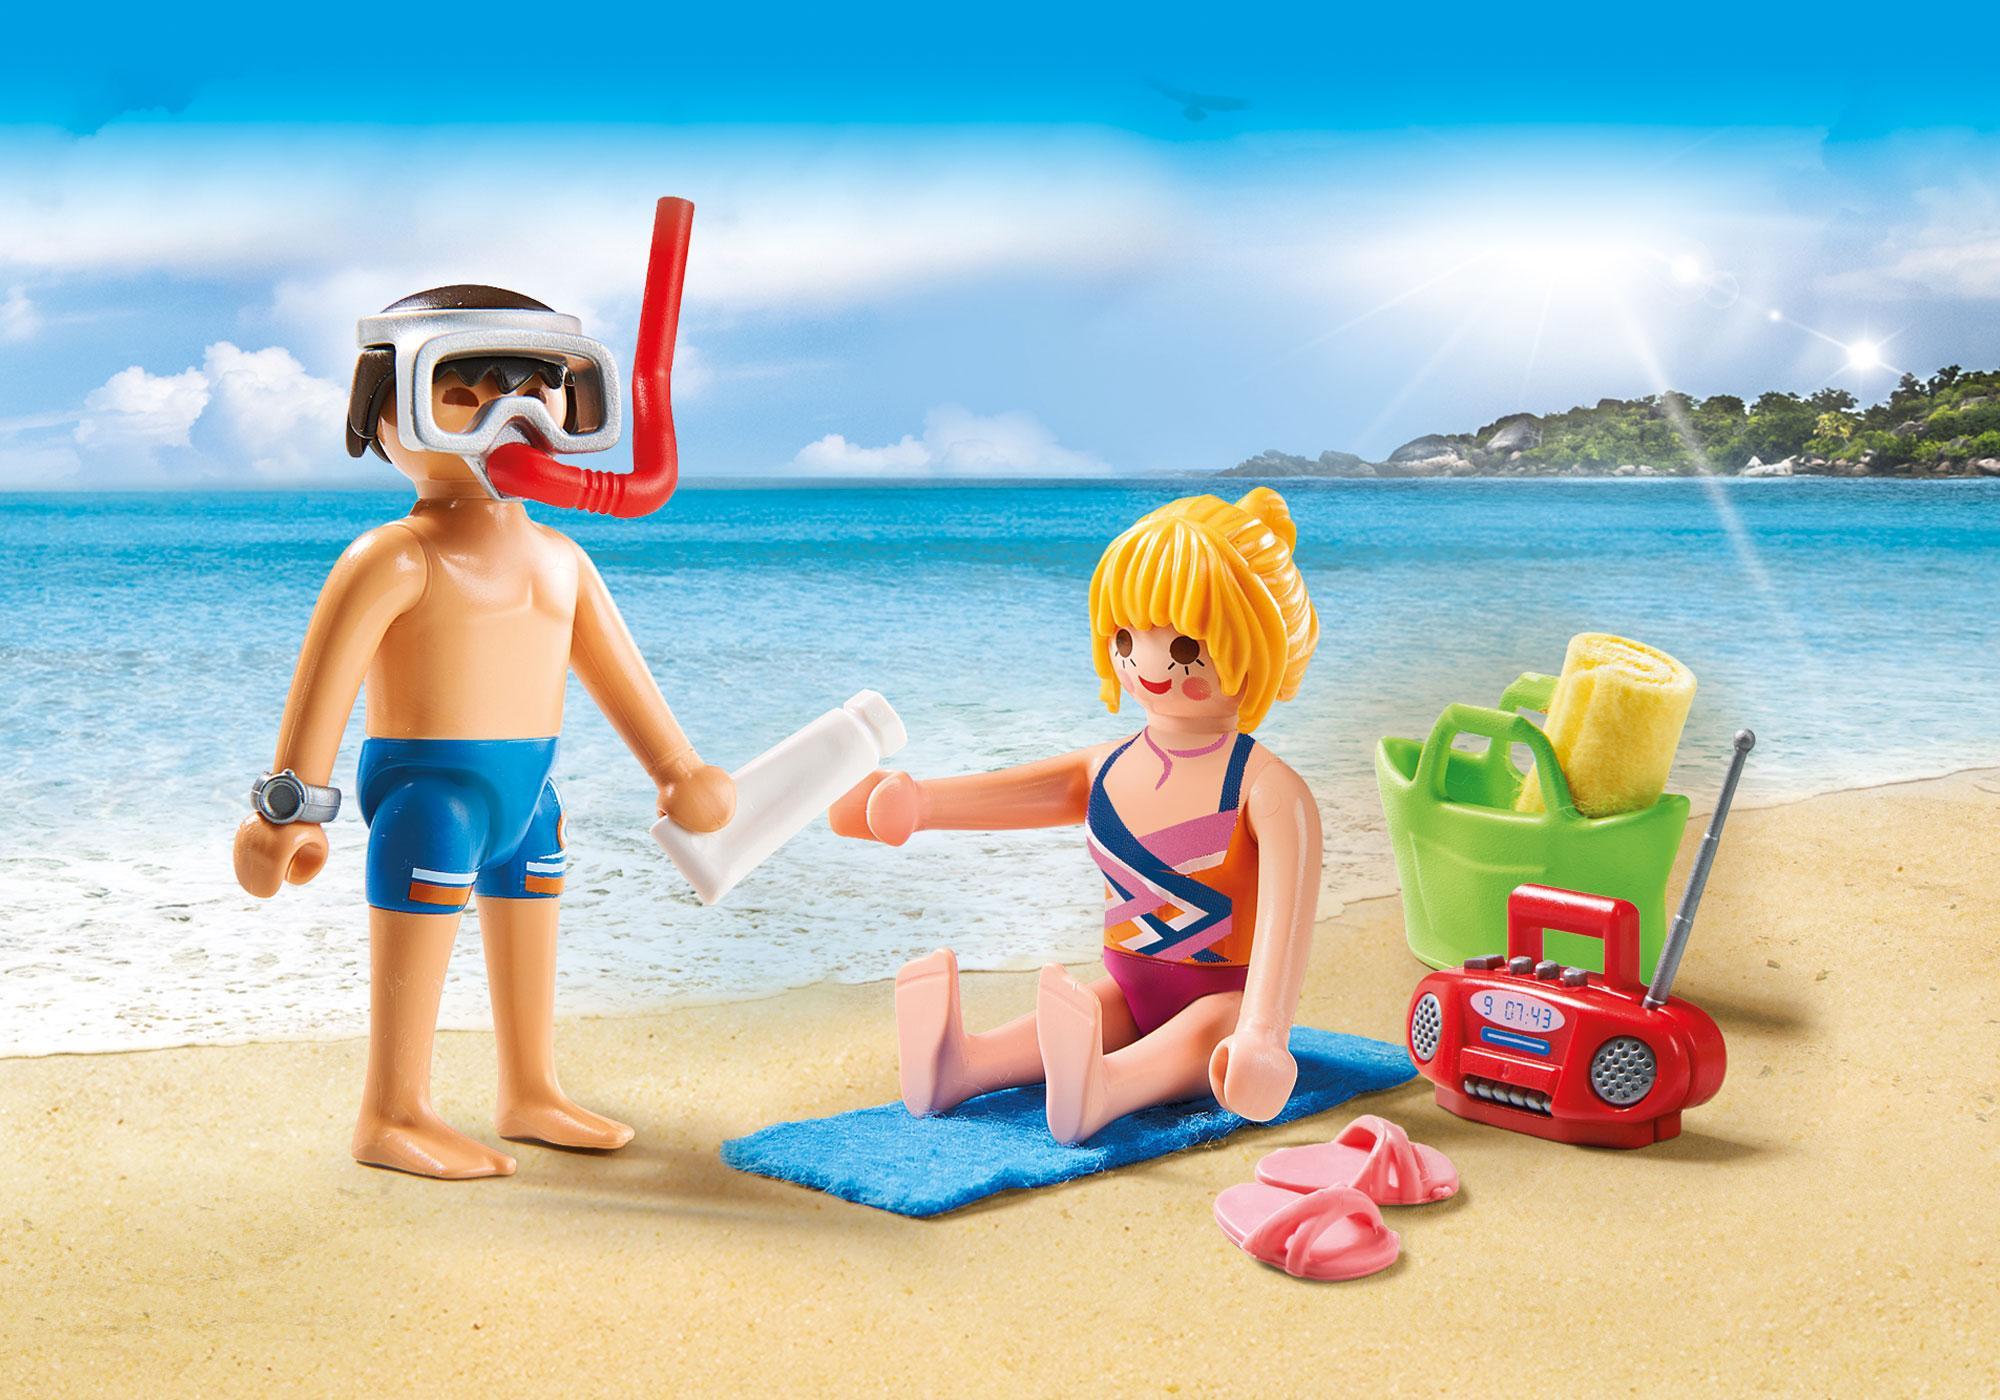 9449_product_detail/Beachgoers